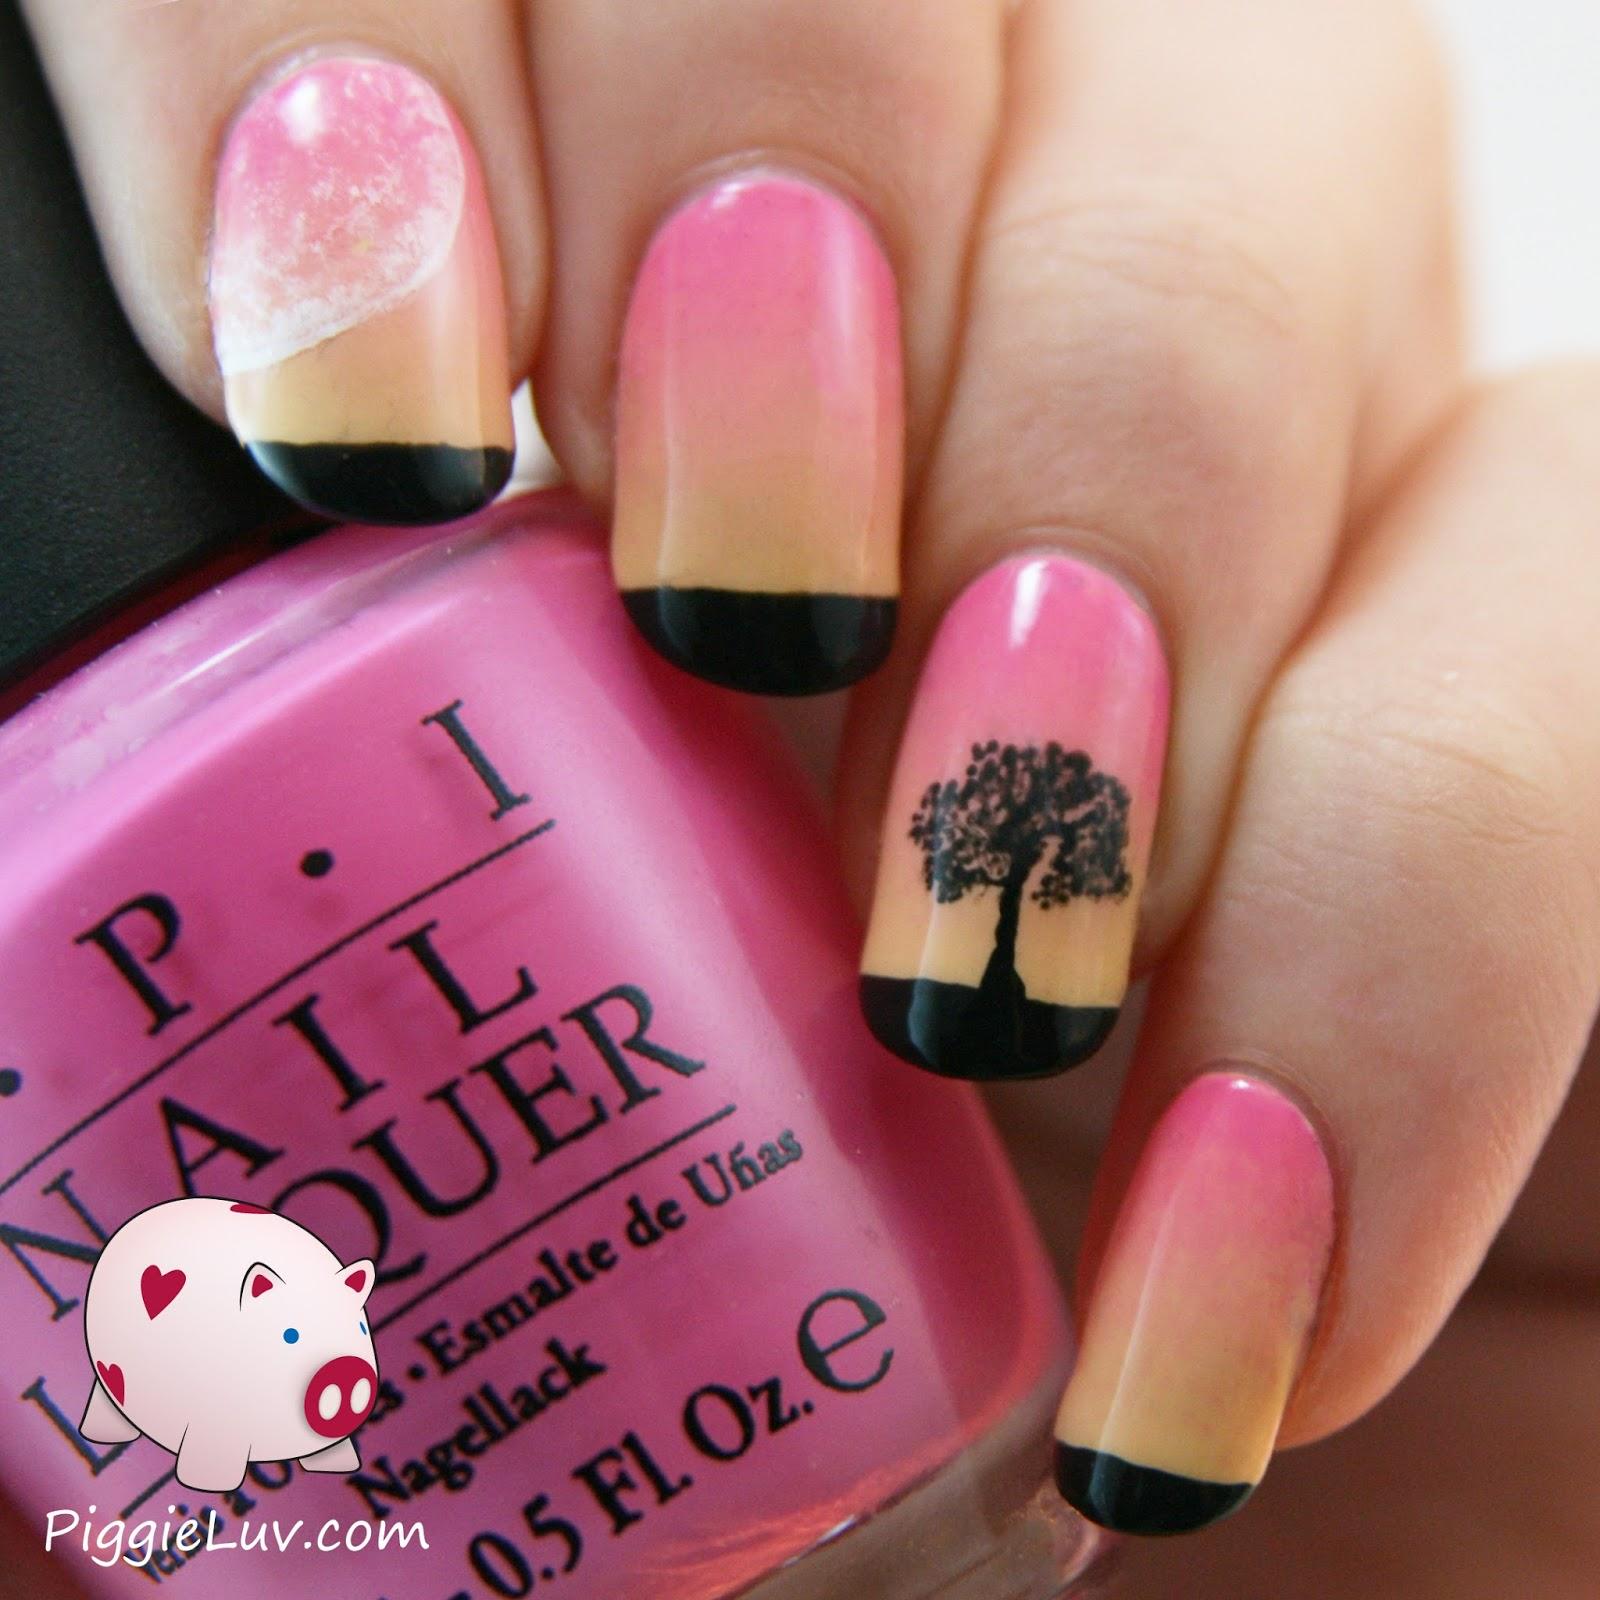 Q Riouser Q Riouser Nail Art: PiggieLuv: Soft Sunset Gradient Nail Art